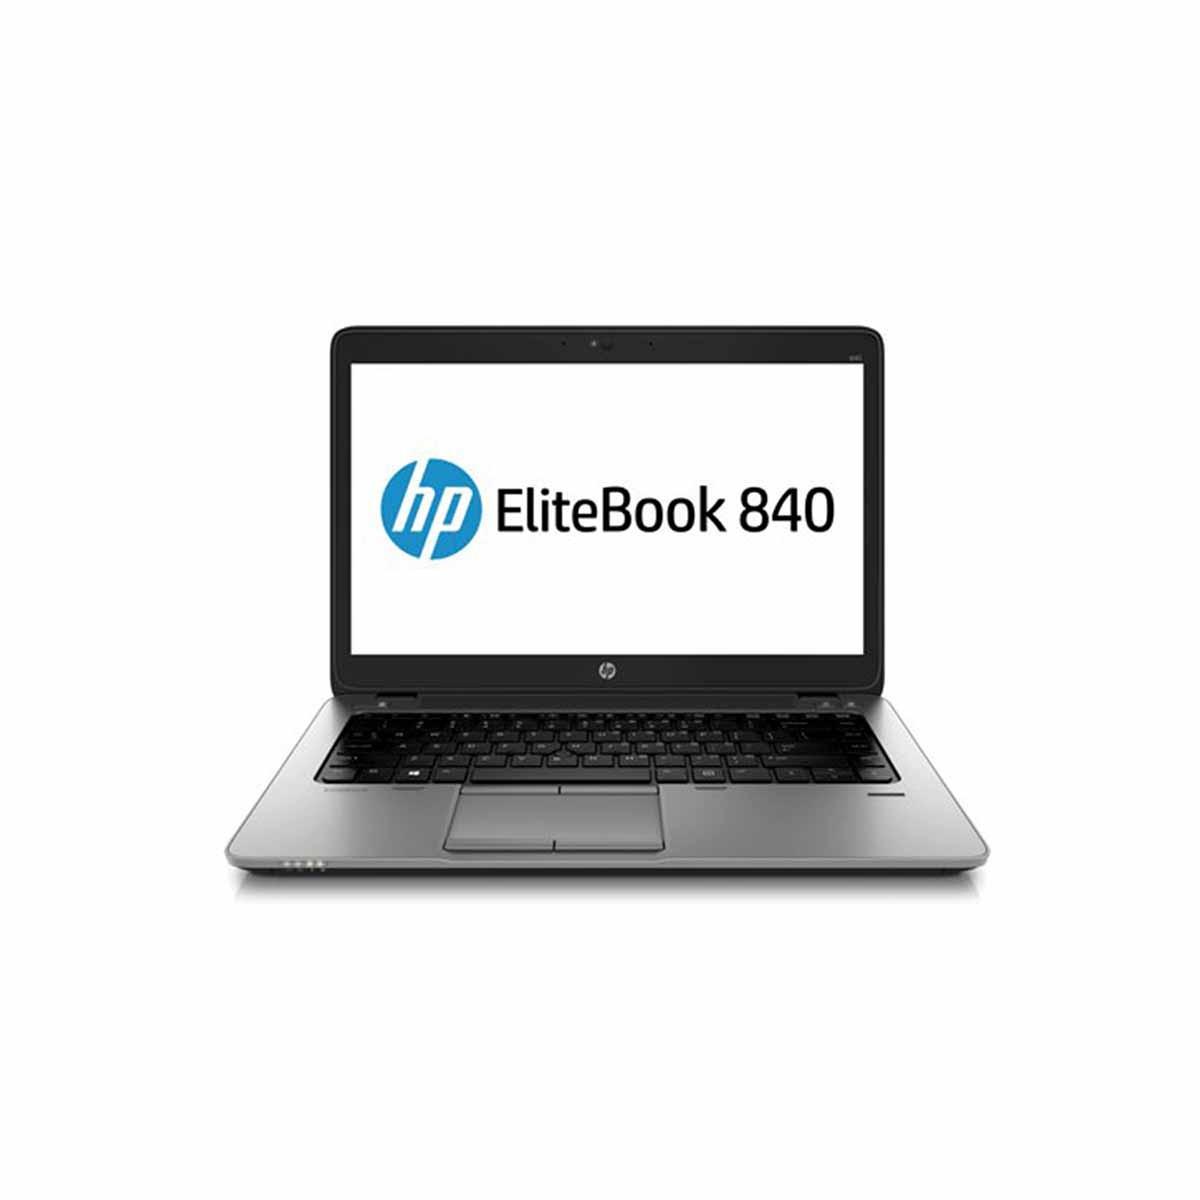 HP-ELI-840-G1-i5-3-HP EliteBook 840 G1 Refurbished Ultrabook 14-inch 256 SSD 8 GB RAM Core i5 Win 10 Pro-image